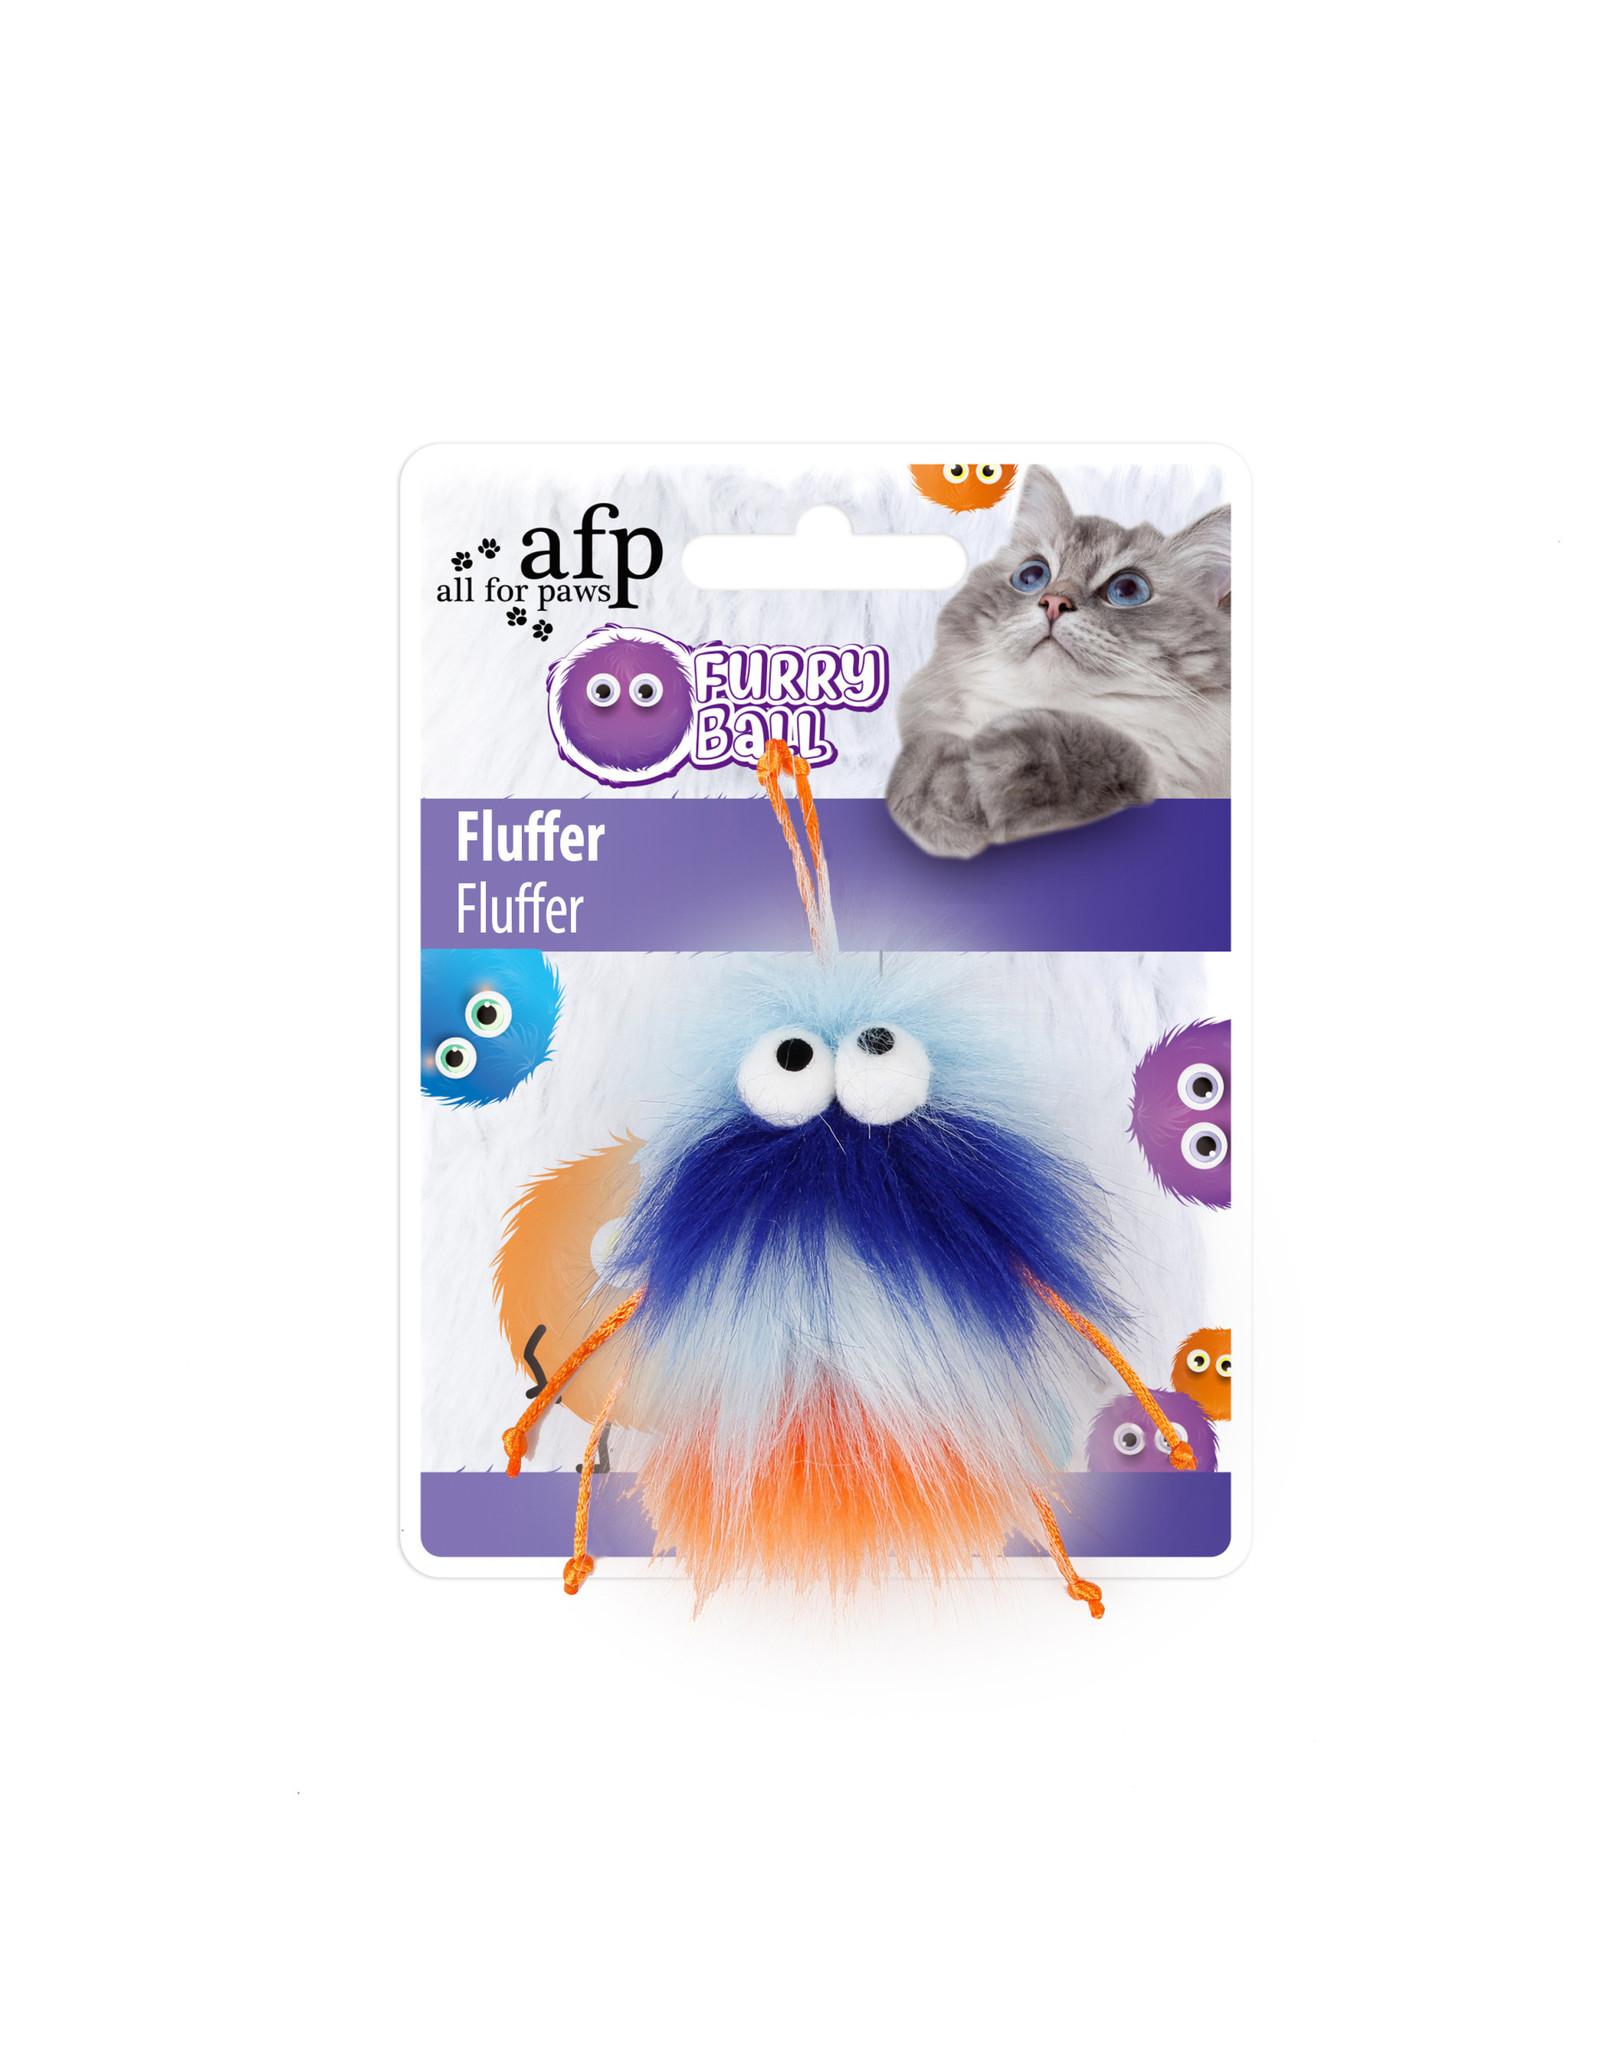 All for Paws Furry Ball Fluffer Orange